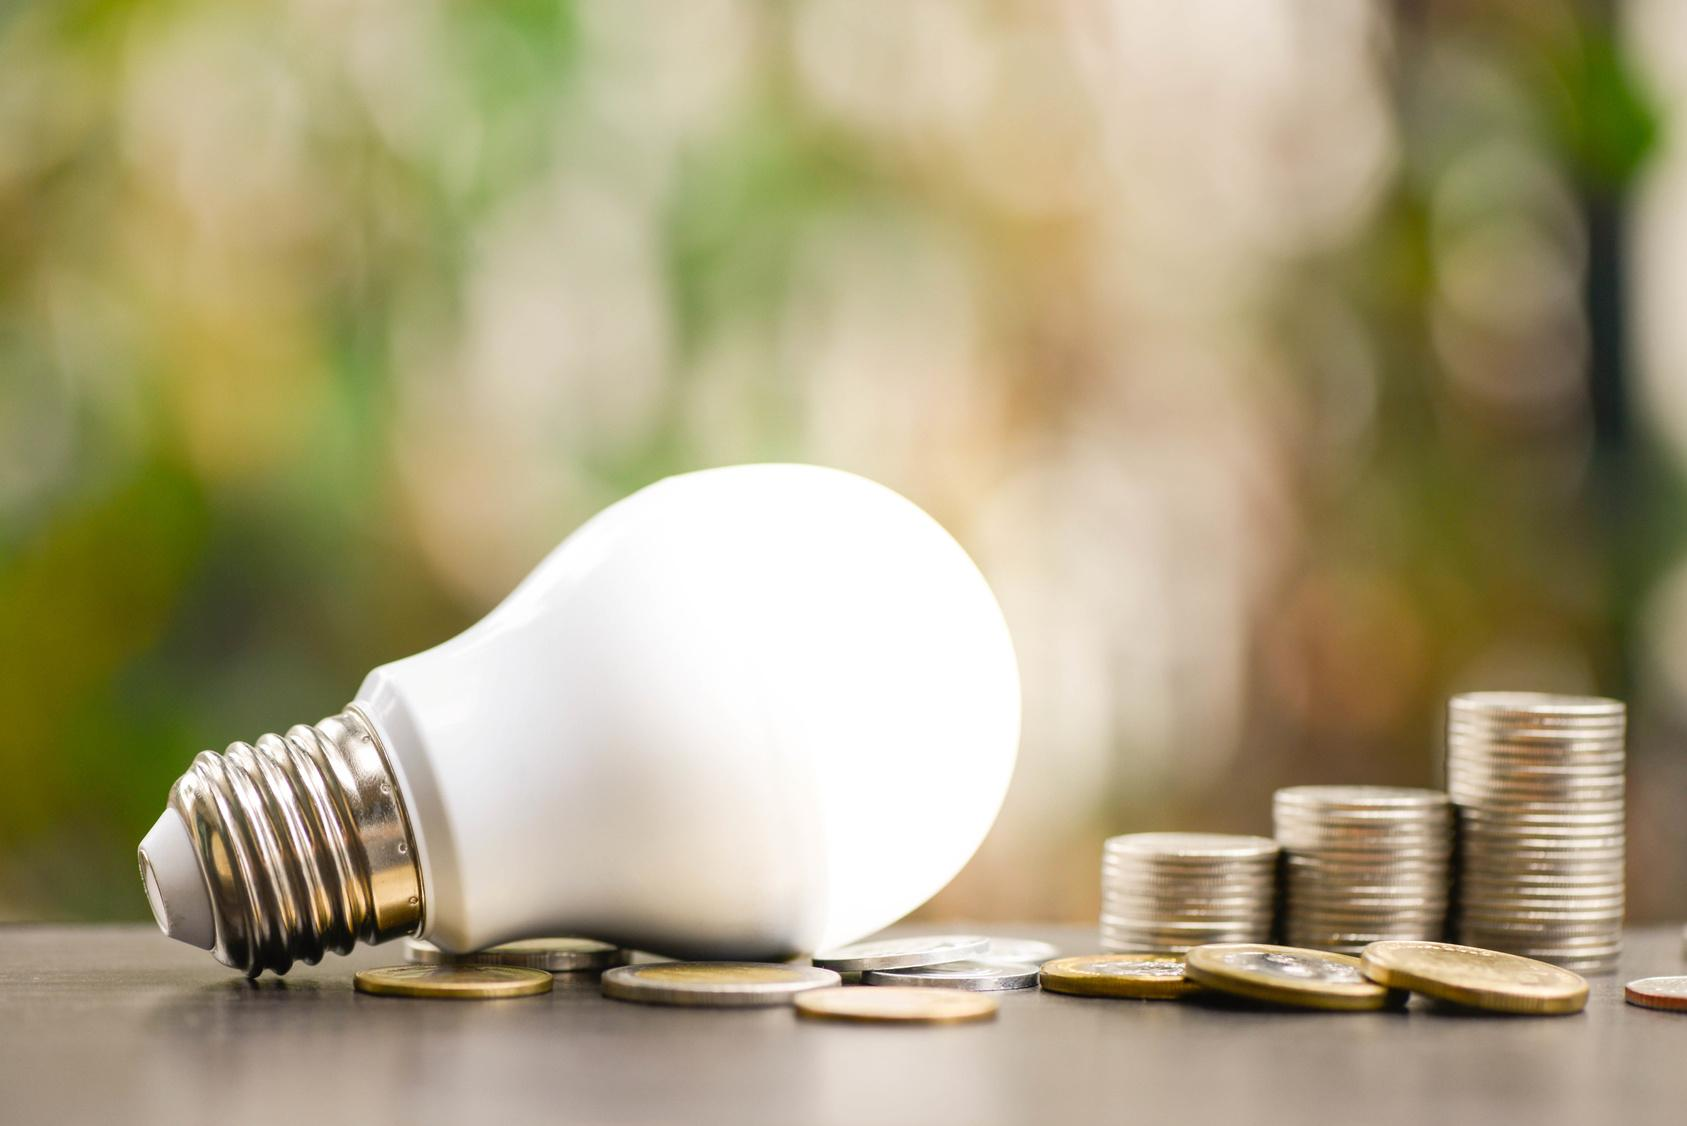 Led lampen sparen mehr strom als energiesparlampen parisarafo Gallery